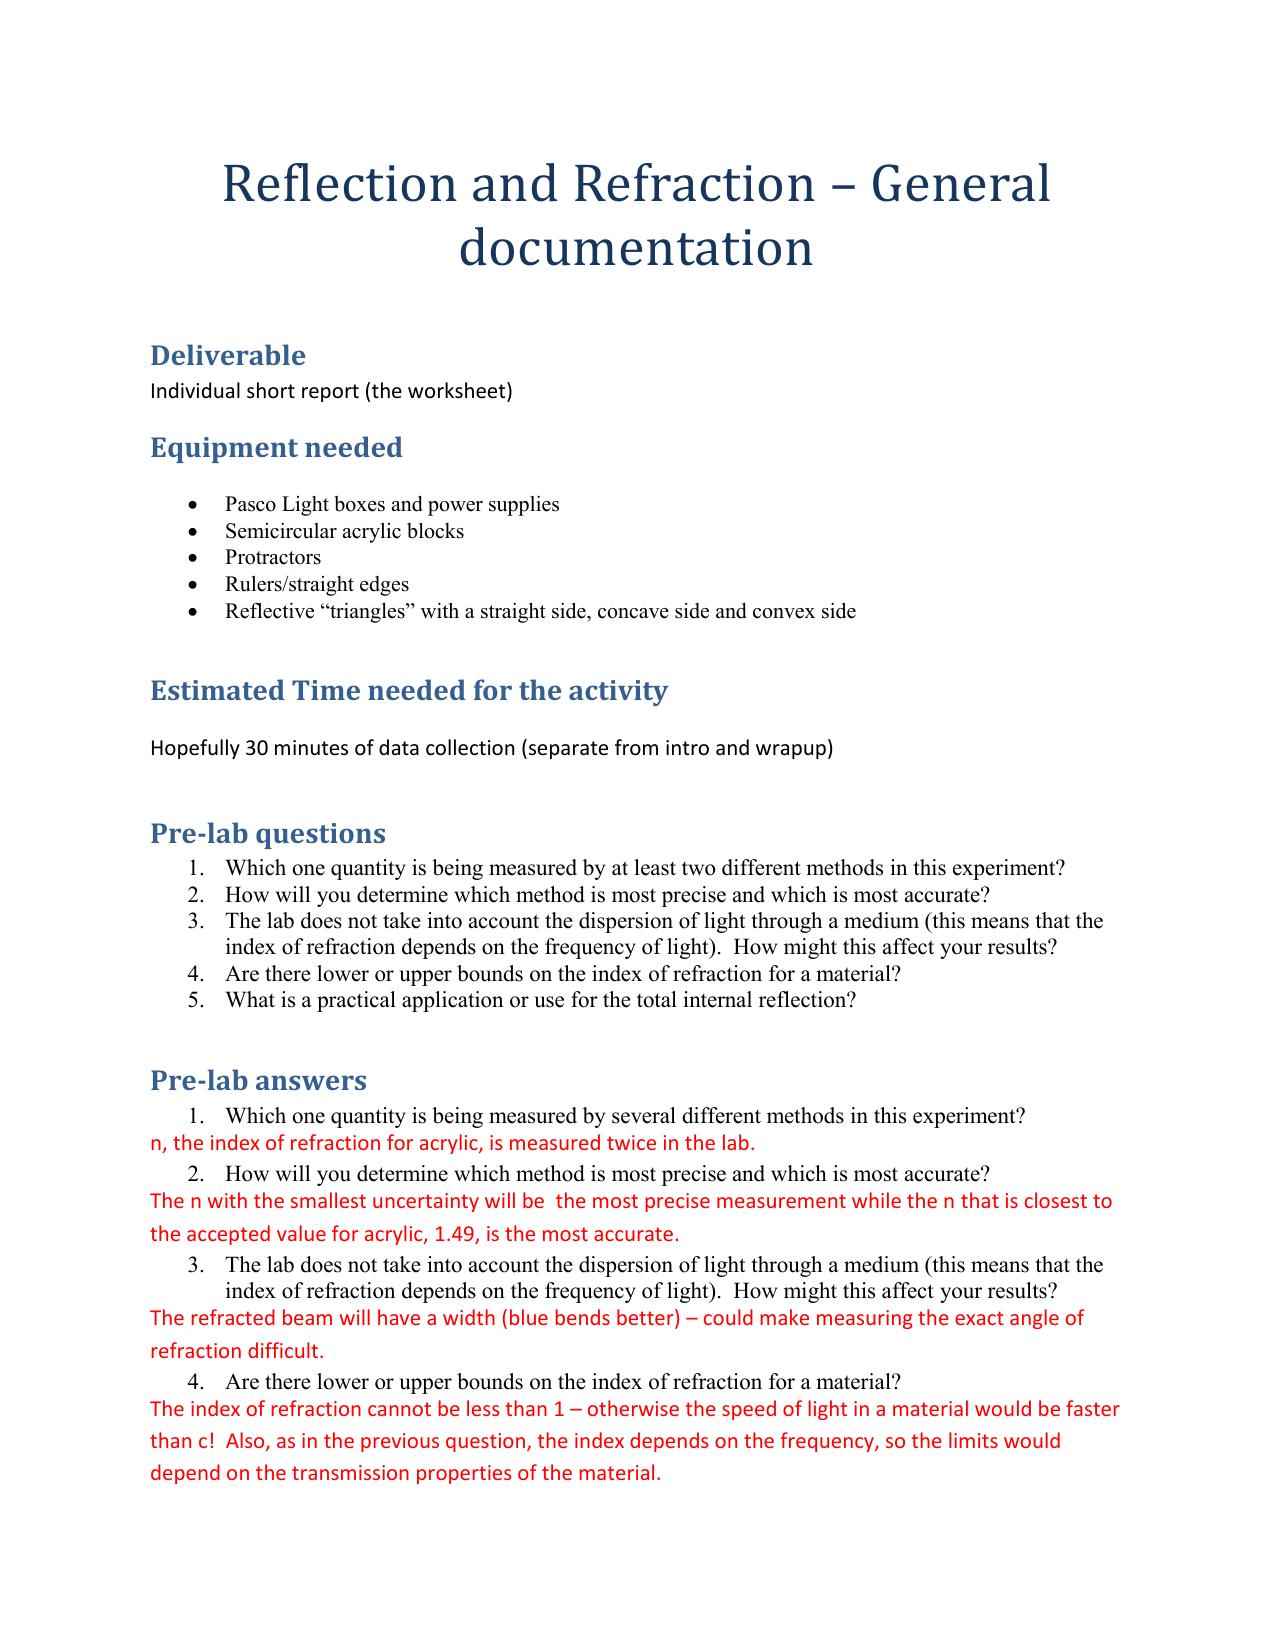 Reflection Refraction Documentation